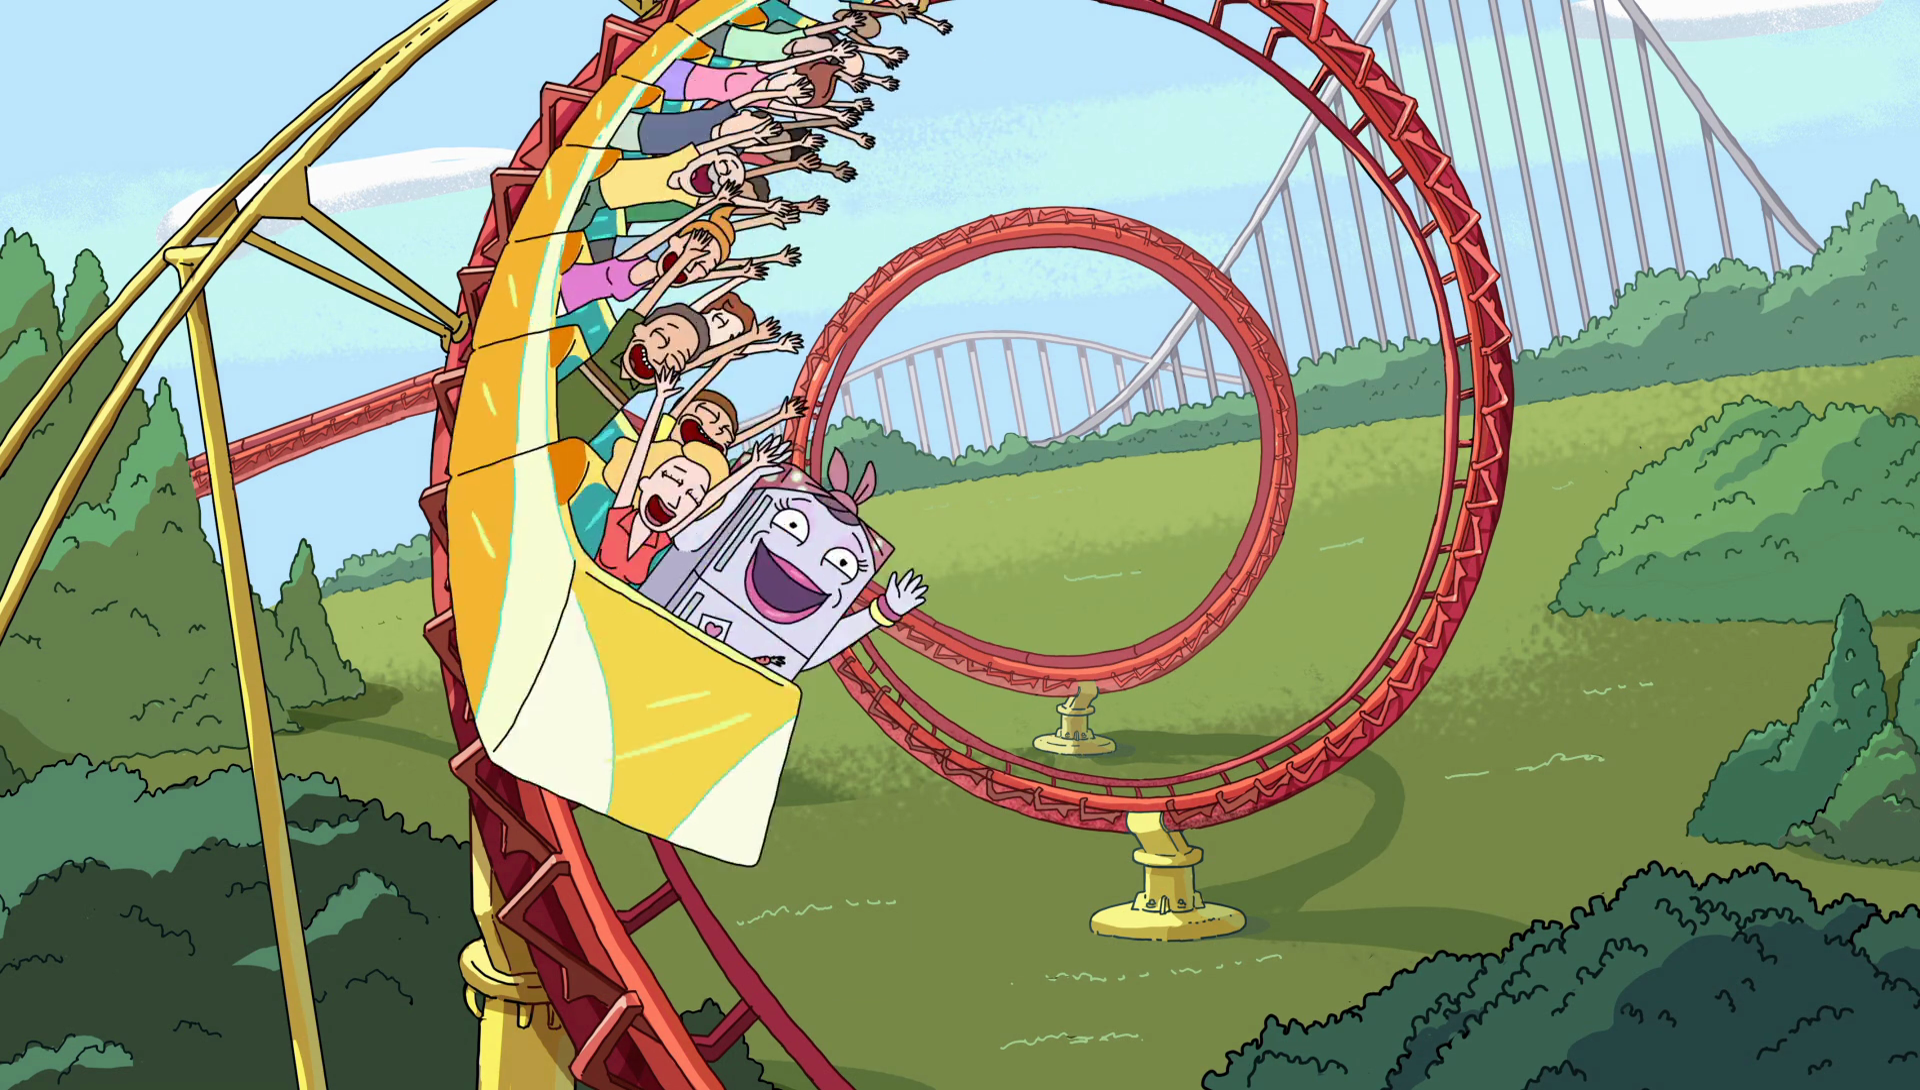 photo The Erotic Roller Coaster